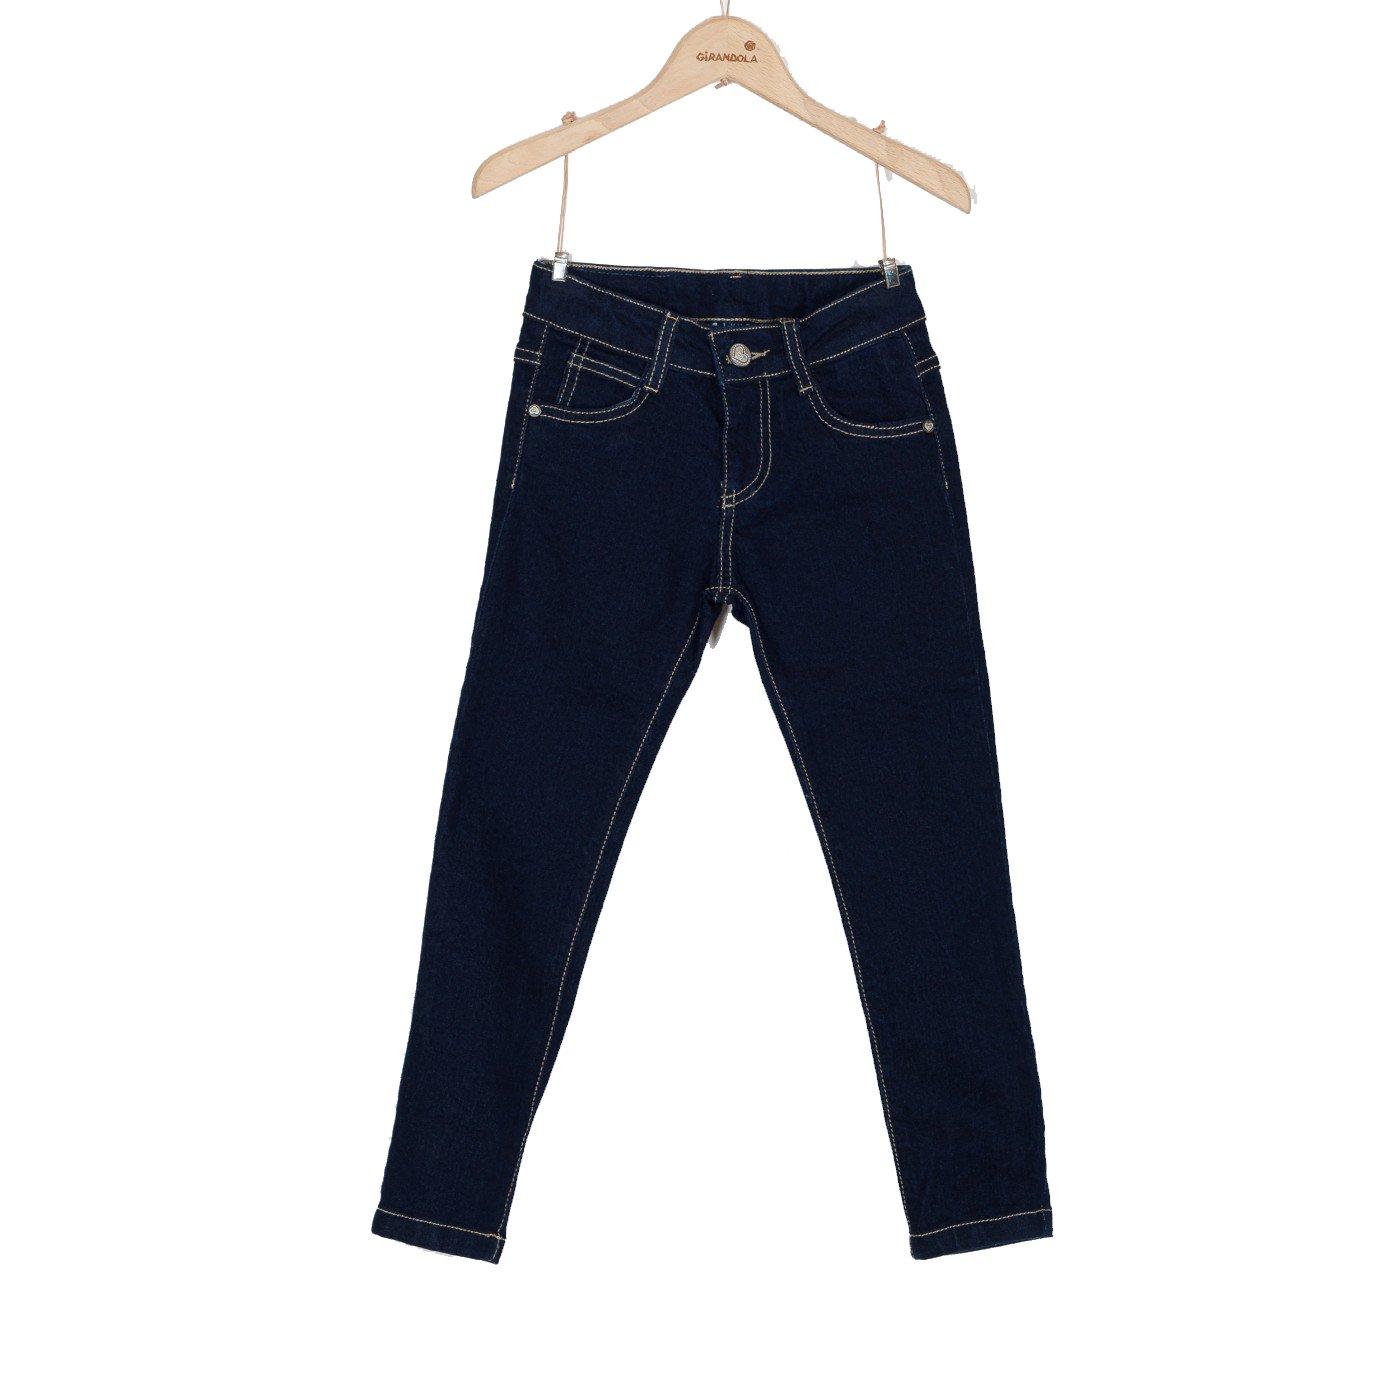 Girandola Girls Denim Jeans